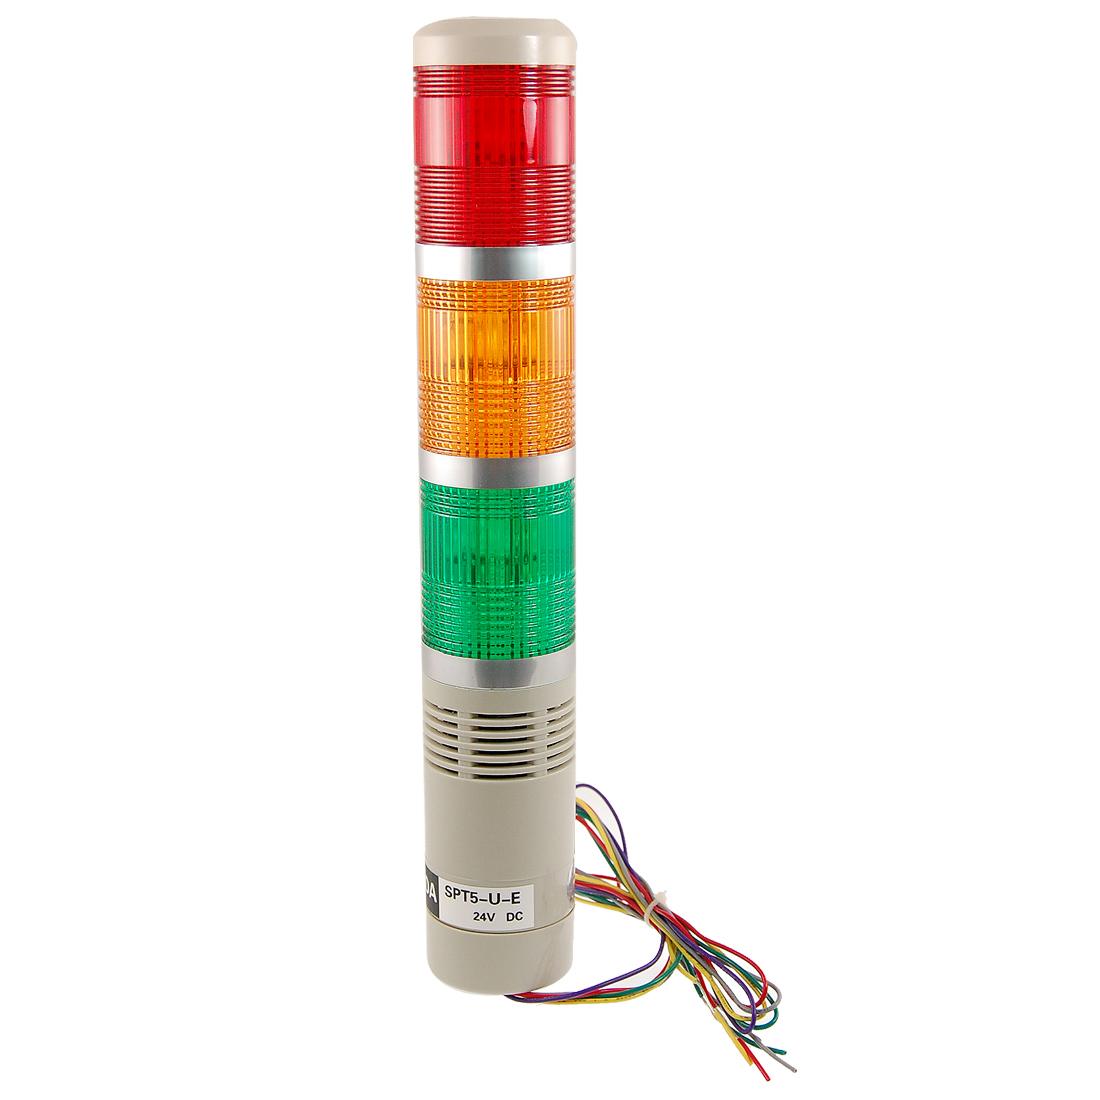 DC 24V Industrial Tower Signal Safety LTE Alarm Light Buzzer w Bracket